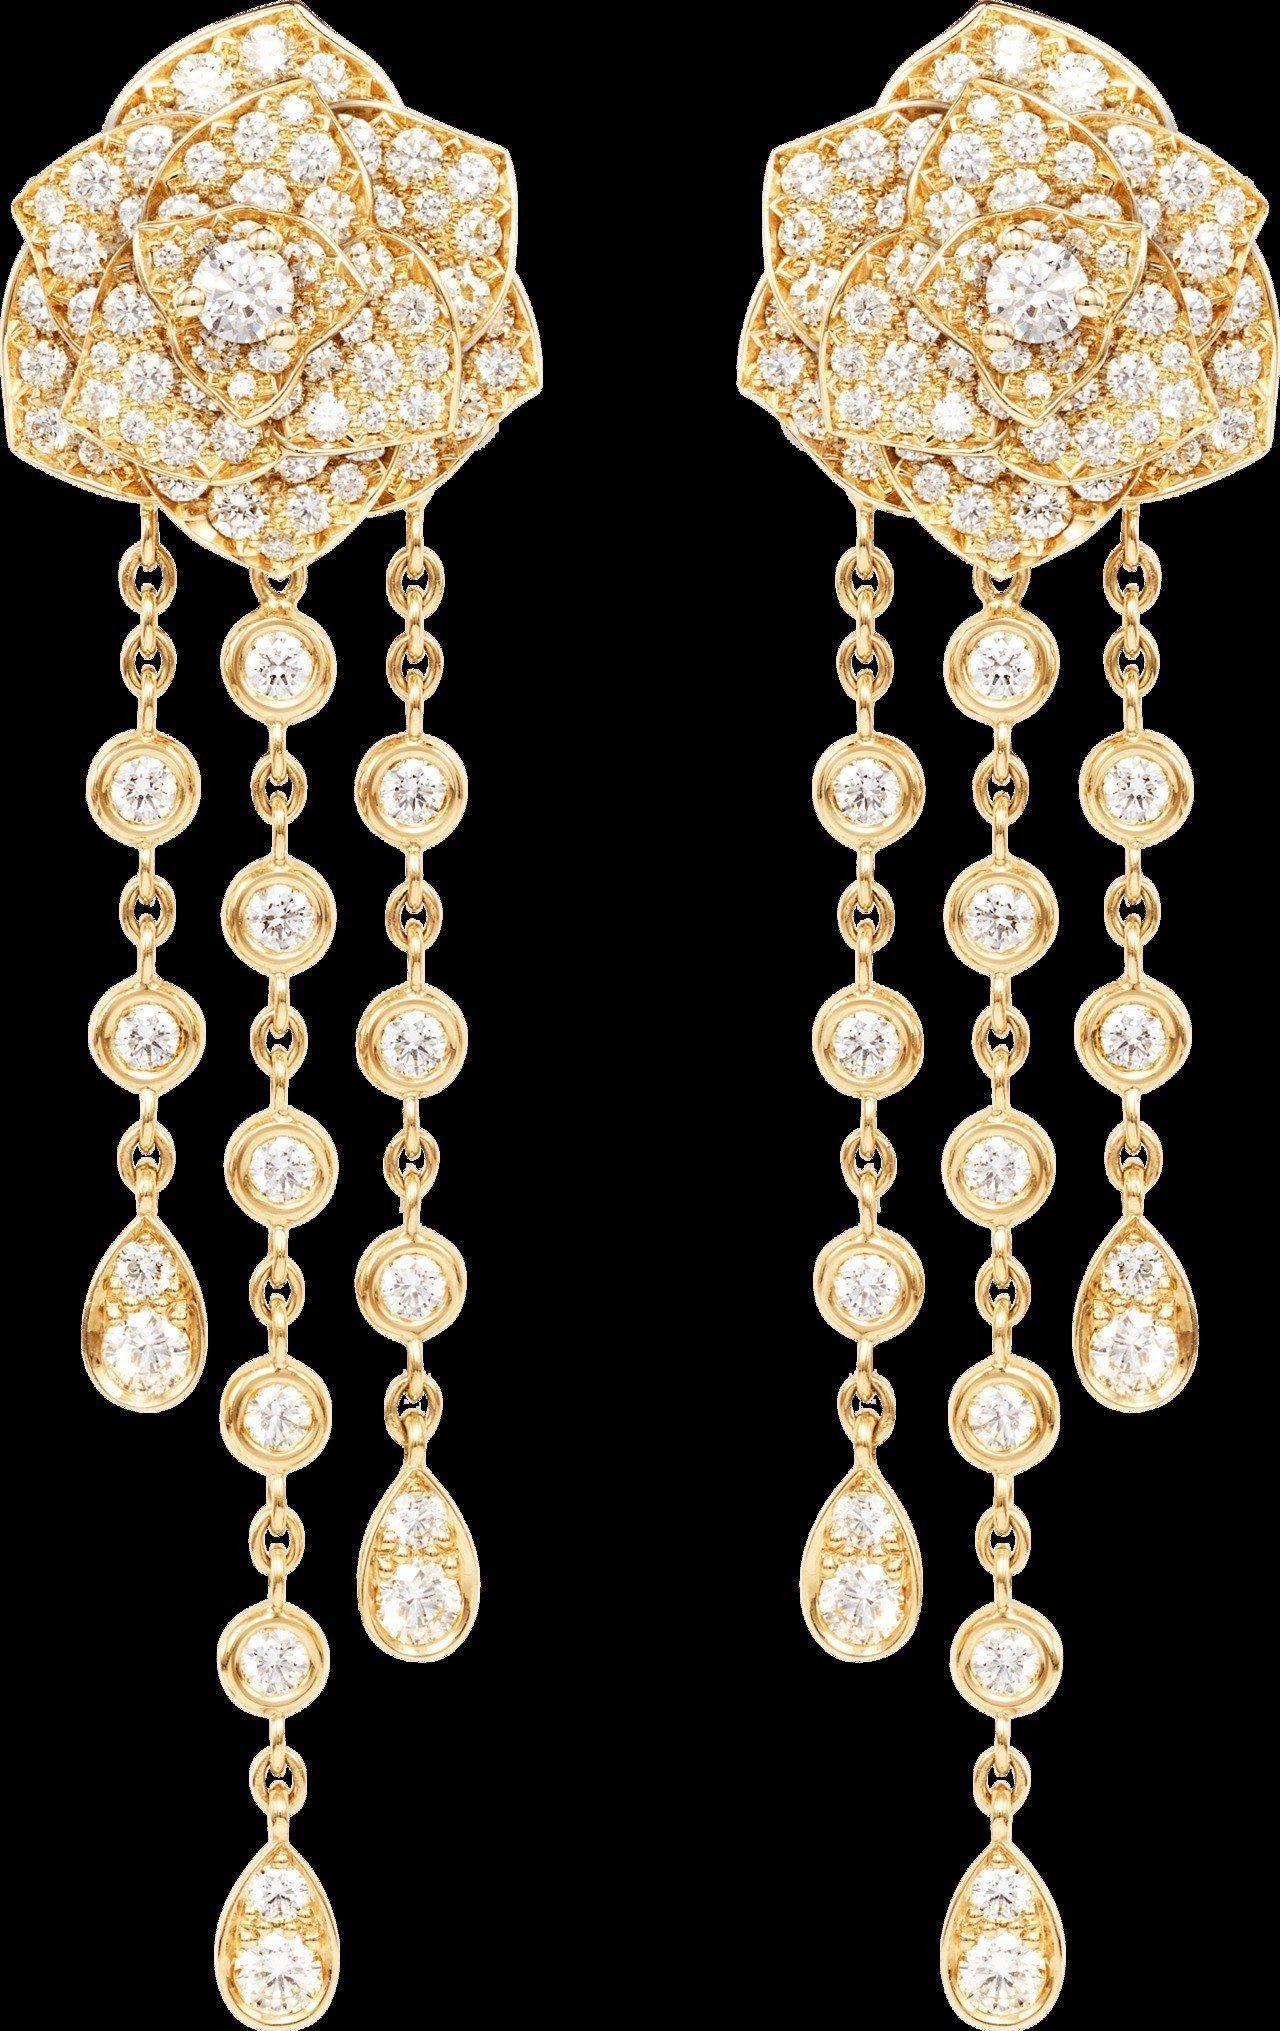 Piaget Rose系列耳環,18K玫瑰金鑲嵌204顆圓形美鑽 共約3.53克...